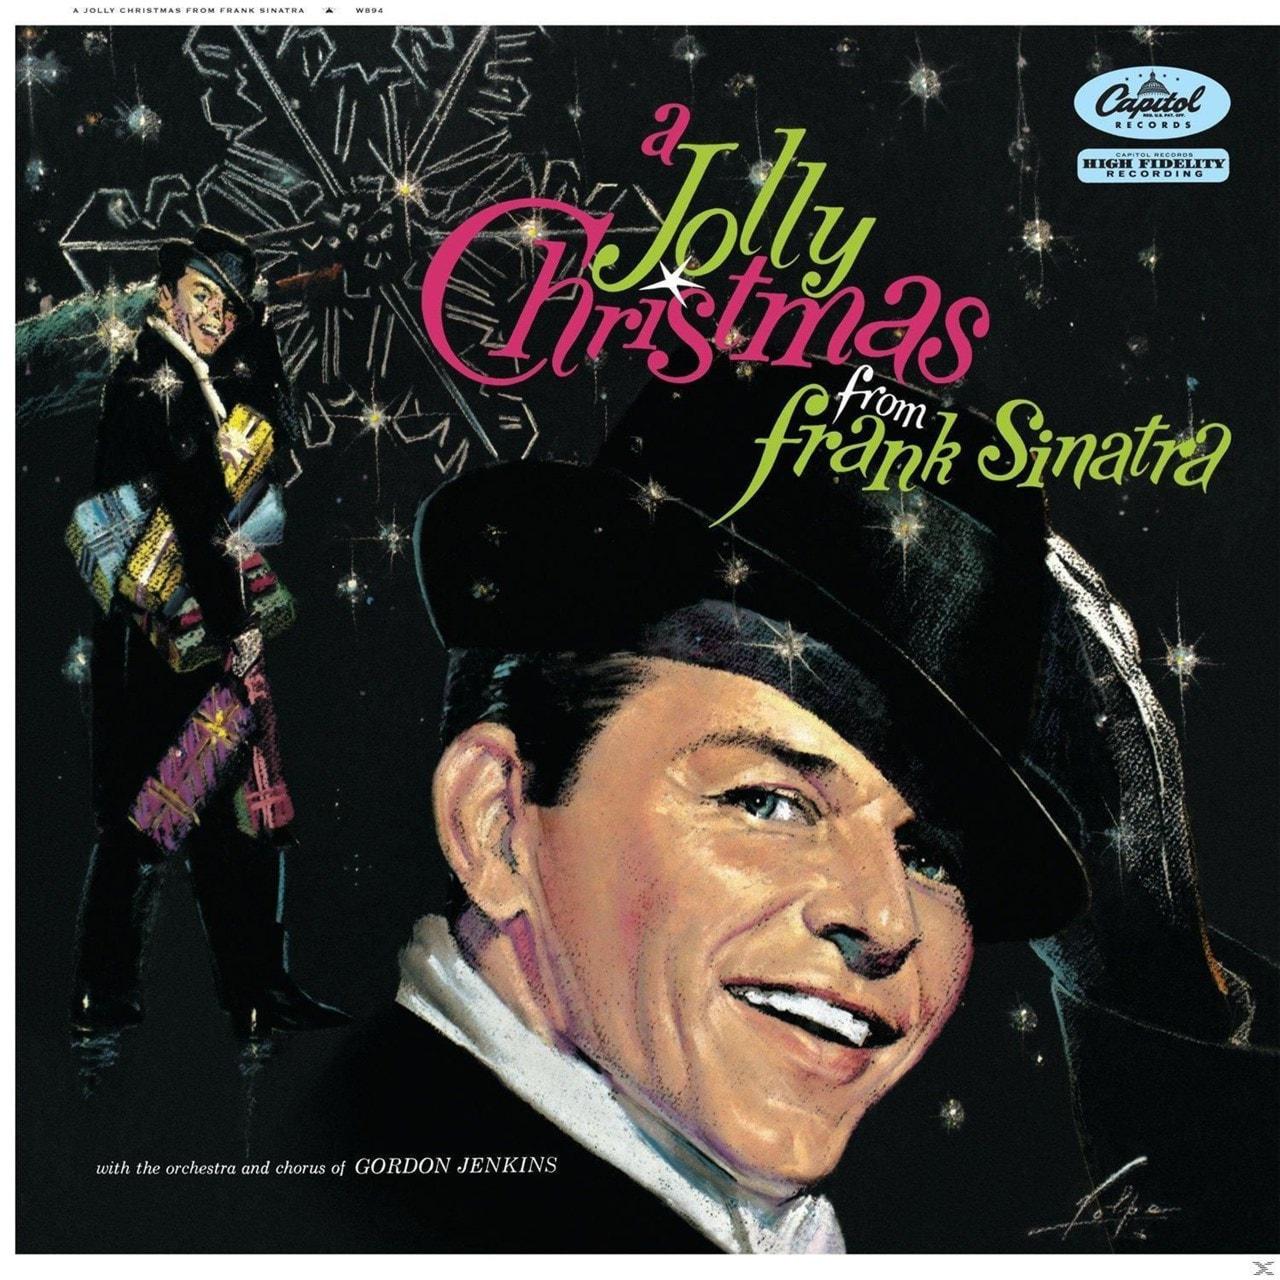 A Jolly Christmas from Frank Sinatra - 1